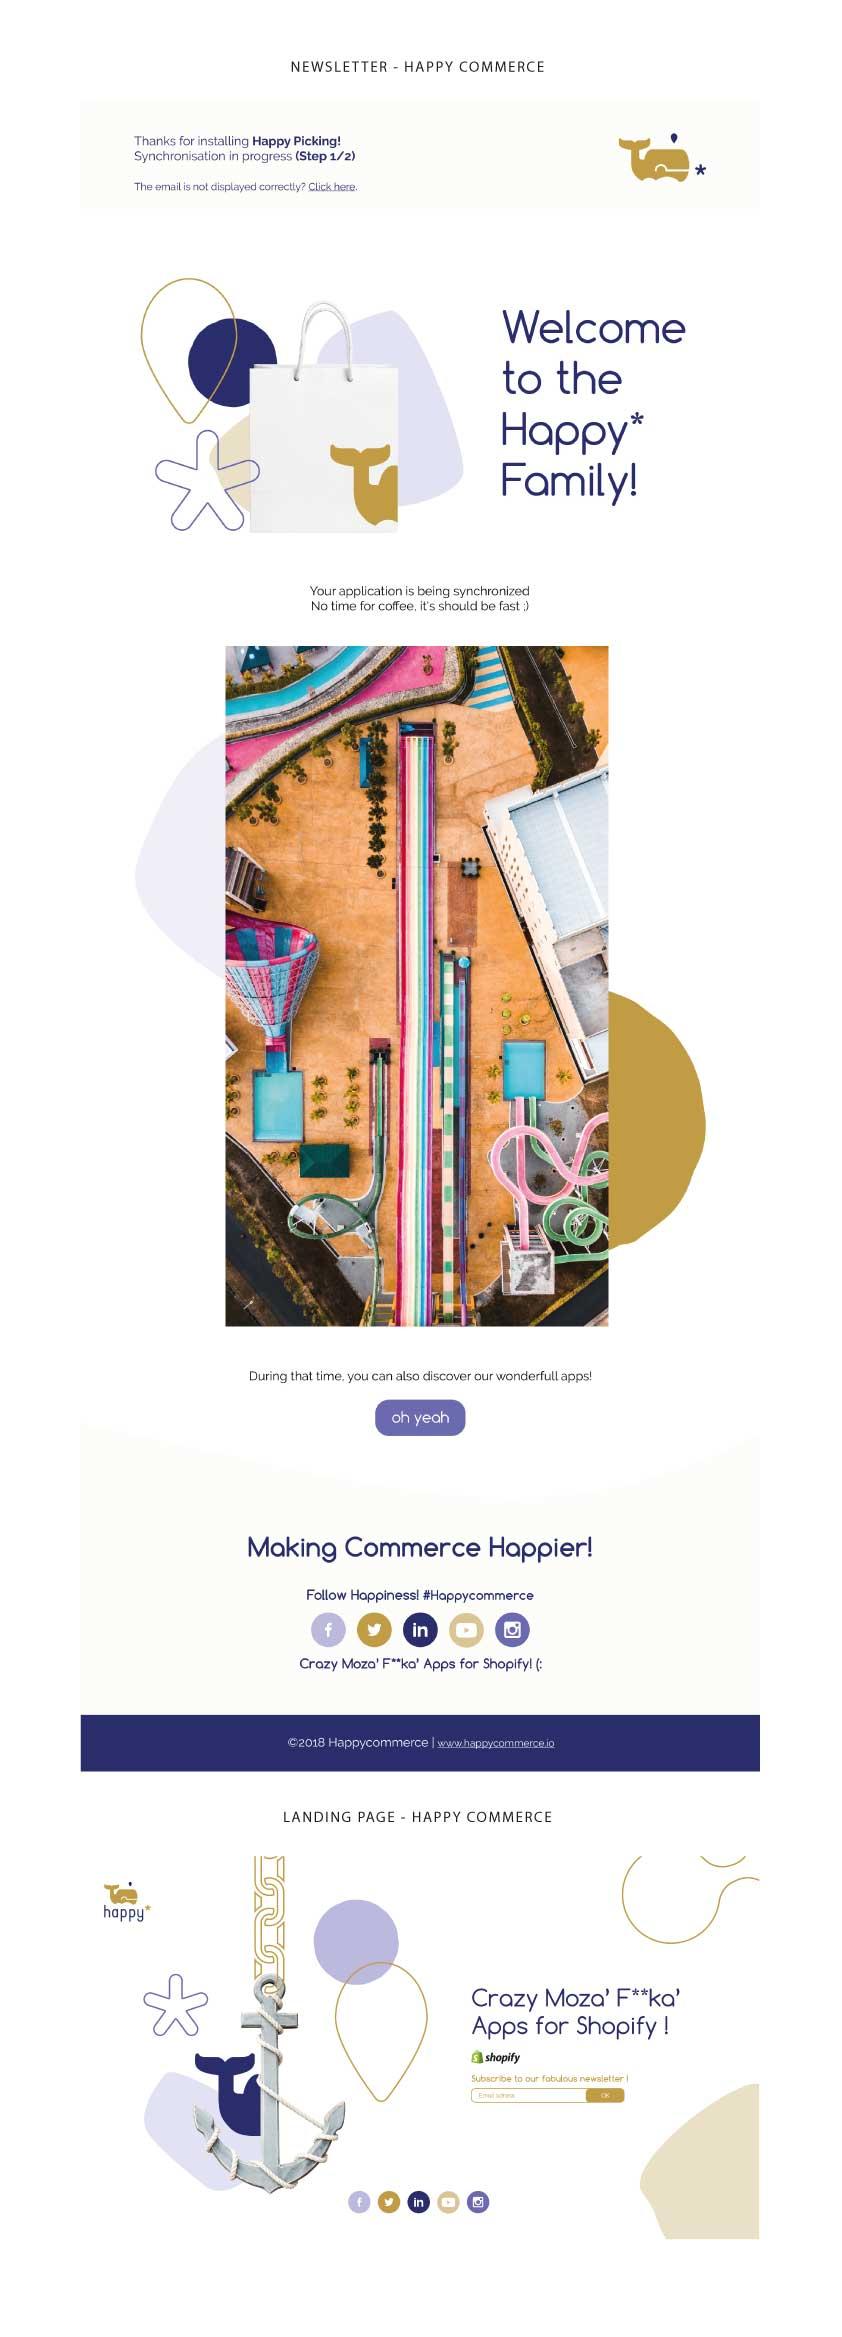 2-Branding-Happy-Commerce-By-Aitana-Design